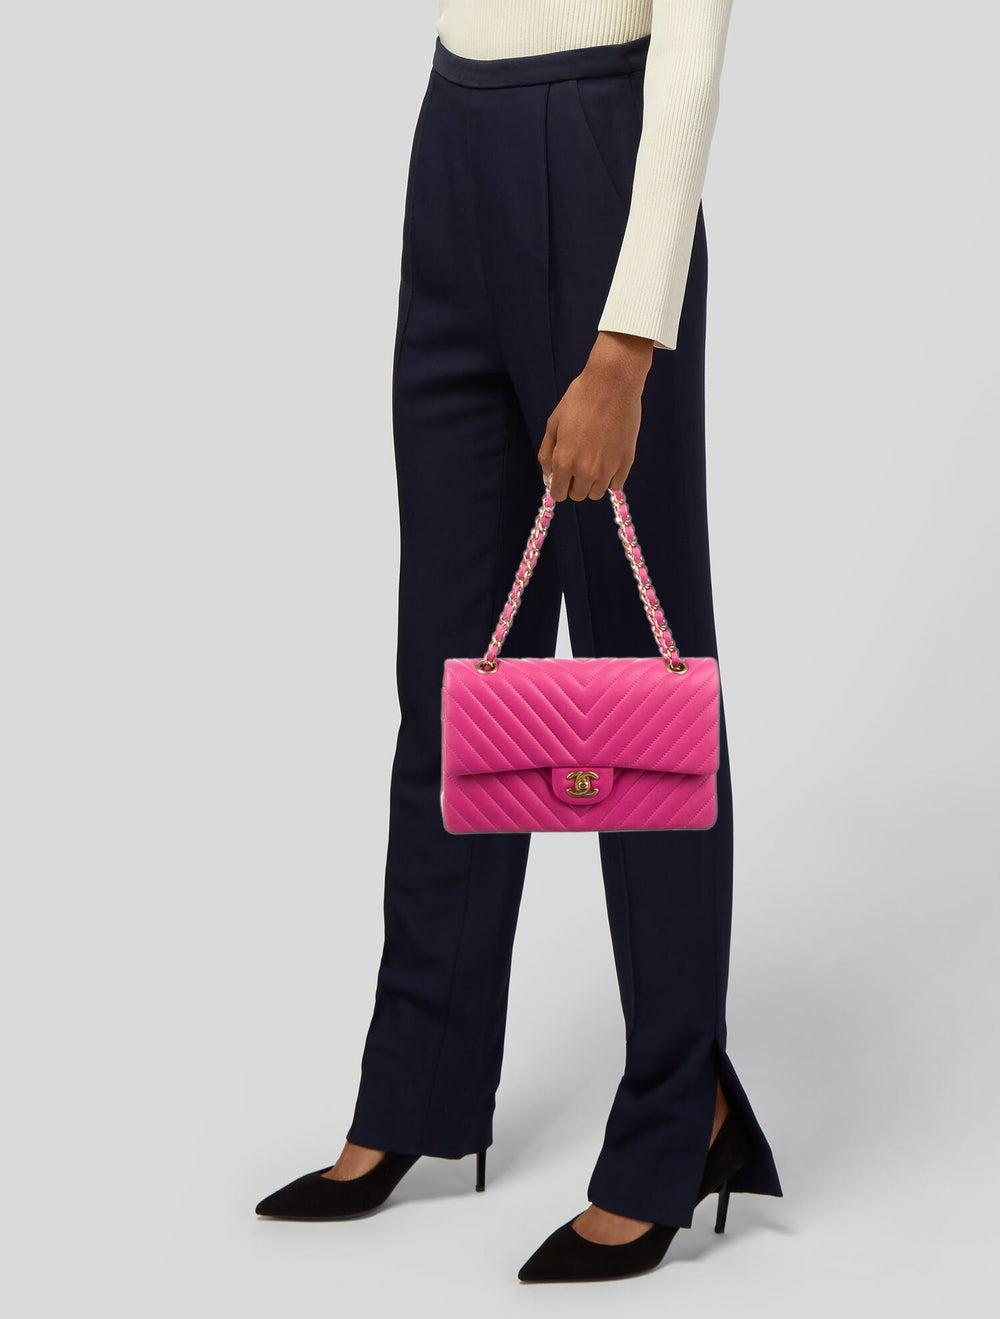 Chanel Chevron Medium Double Flap Bag Pink - image 2